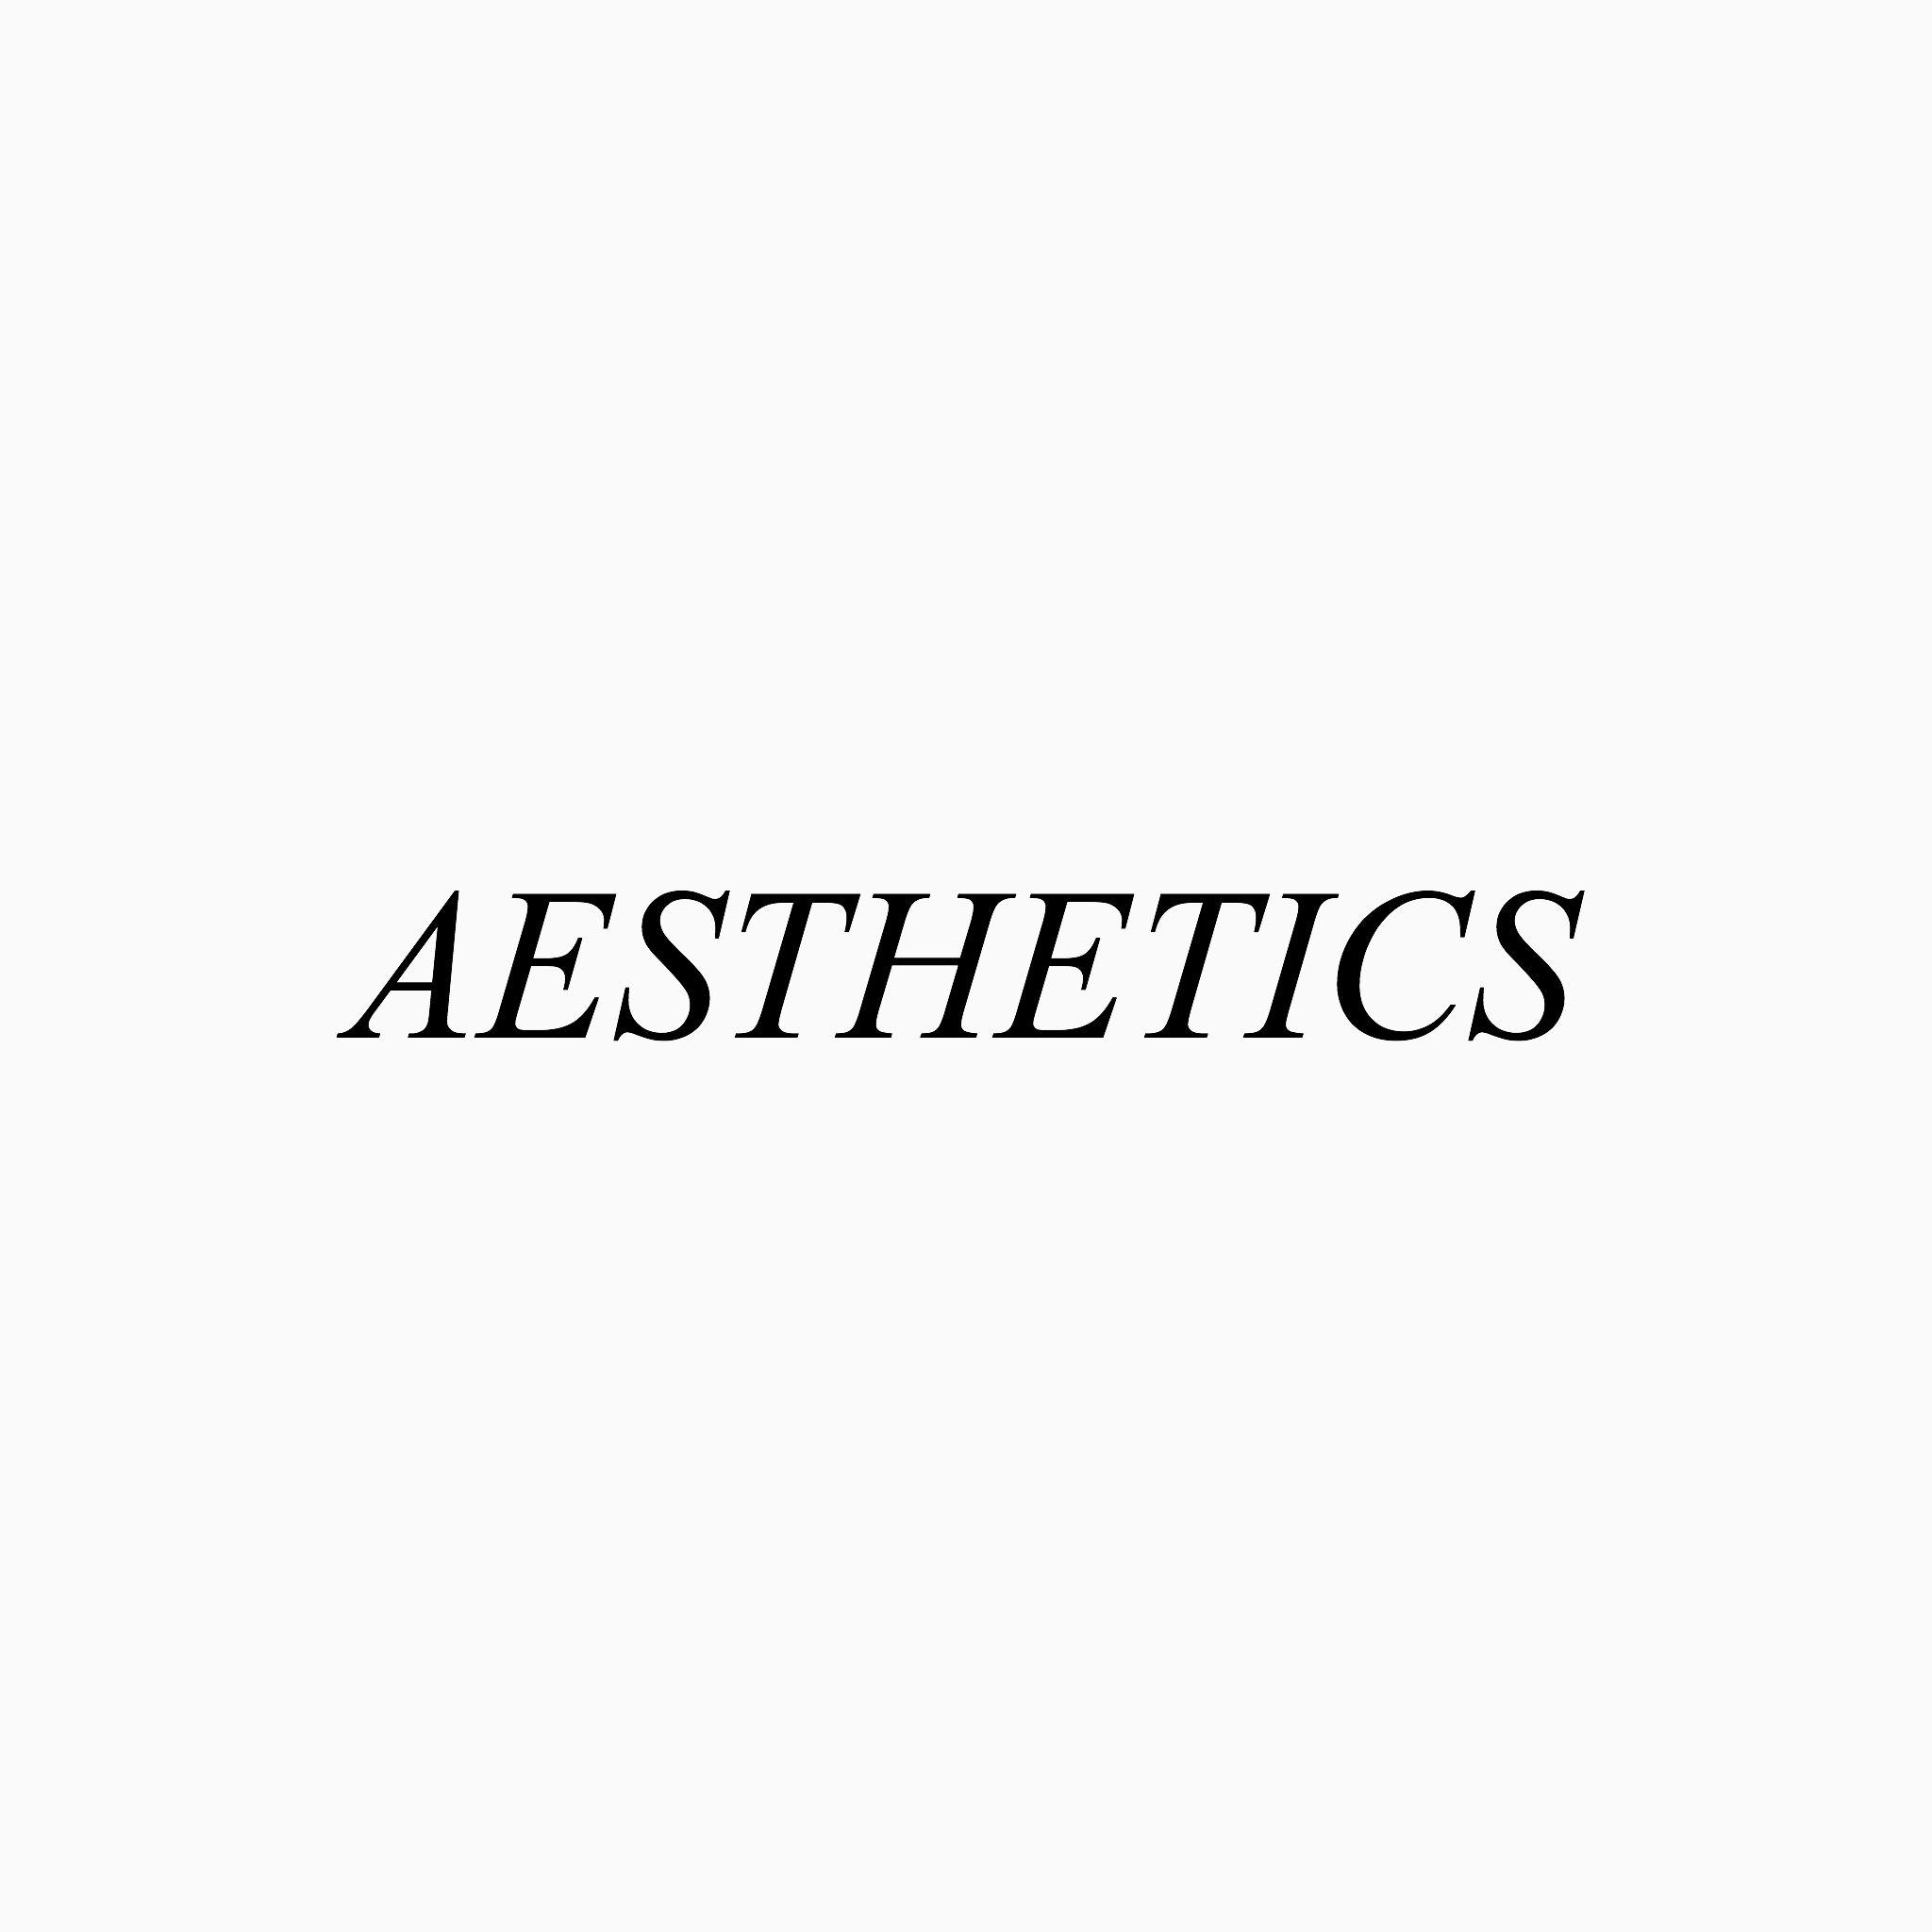 Pin by 𝔞𝔟𝔦𝔤𝔞𝔦𝔩 on aesthetics pinterest